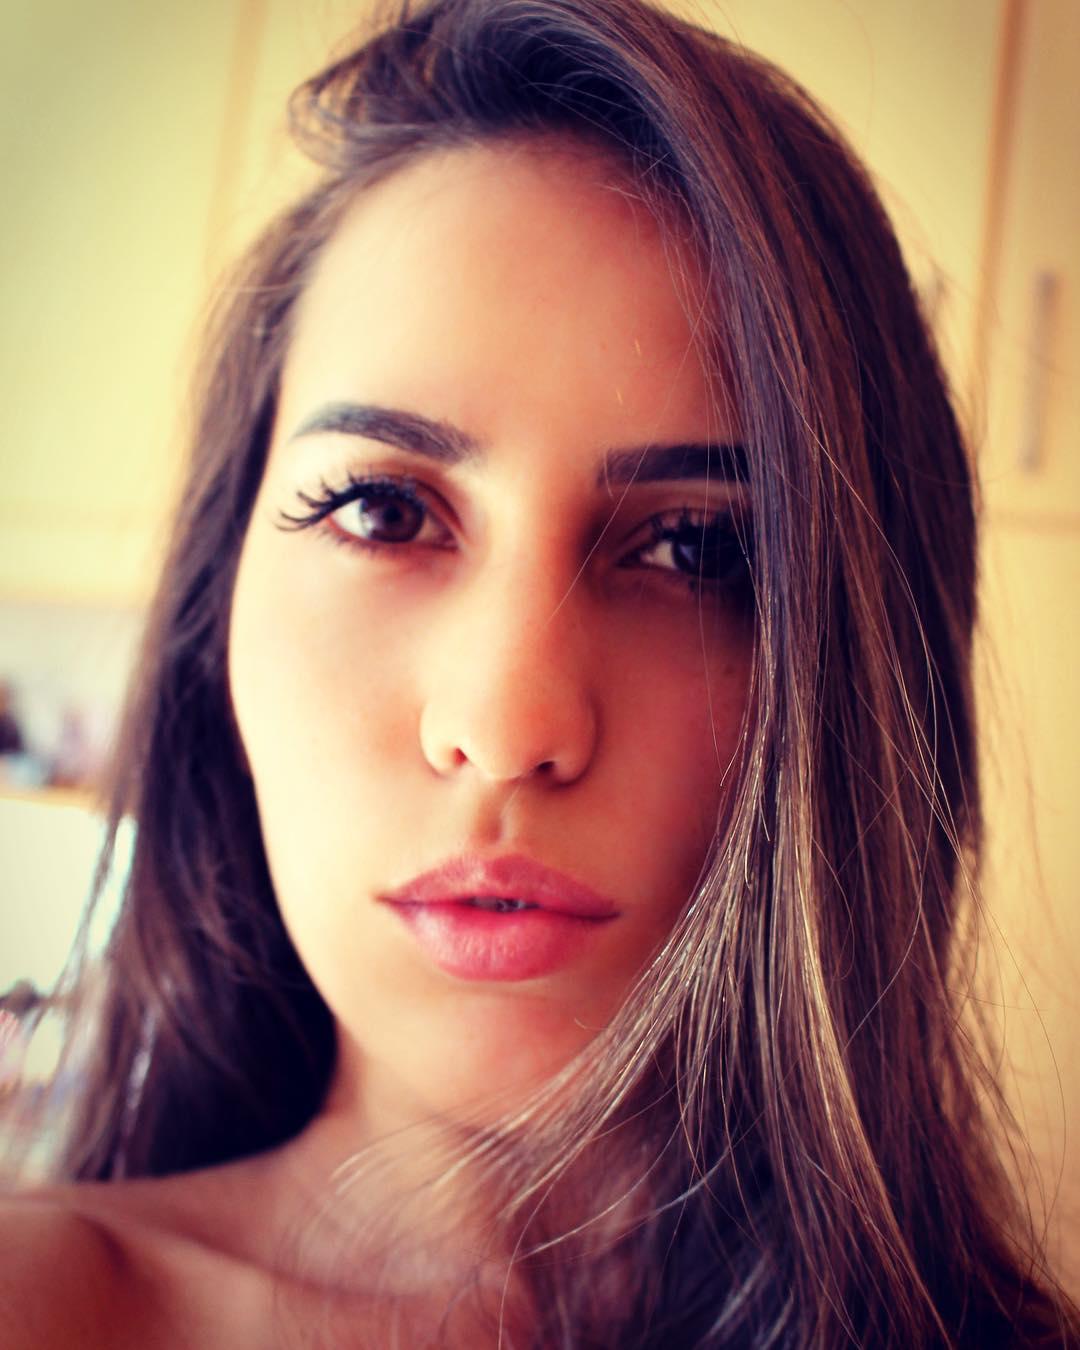 Amanda-Miguez-Wallpapers-Insta-Fit-Bio-6